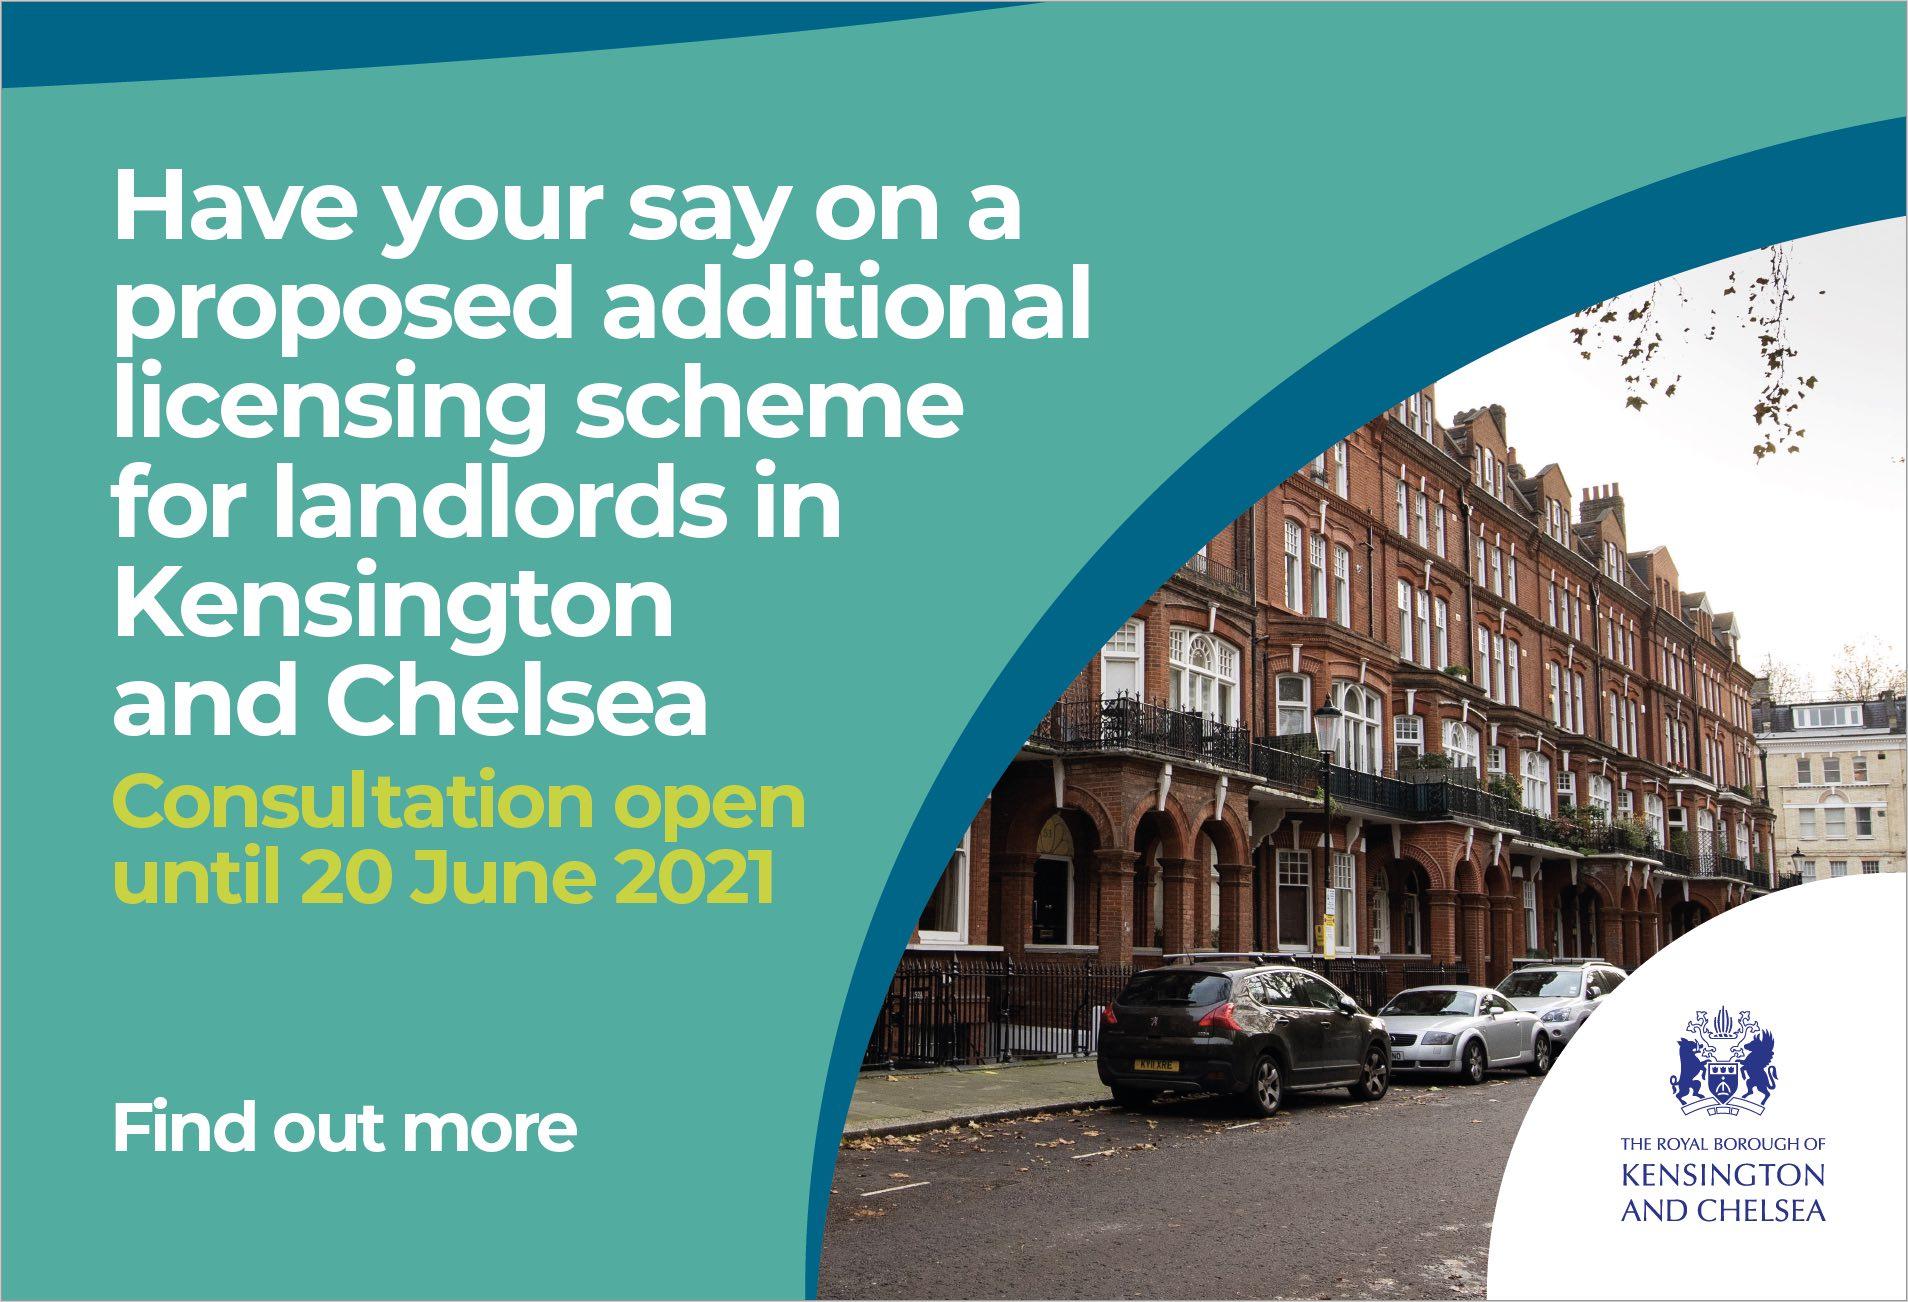 Kensington & Chelsea additional licensing consultation 2021